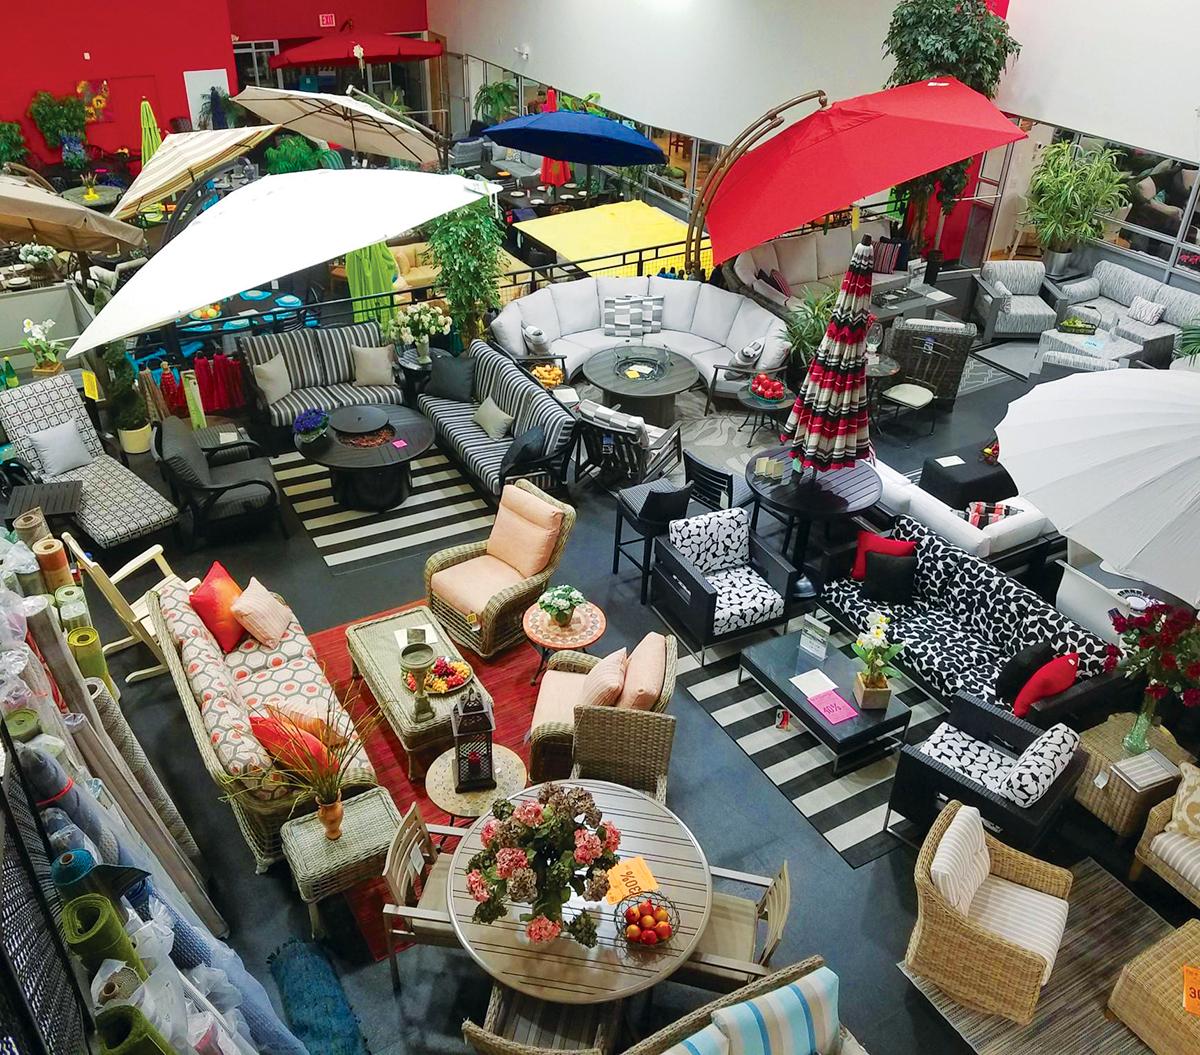 Tropicraft: Over 10 Showrooms of Exquisite Patio & HomeFurniture